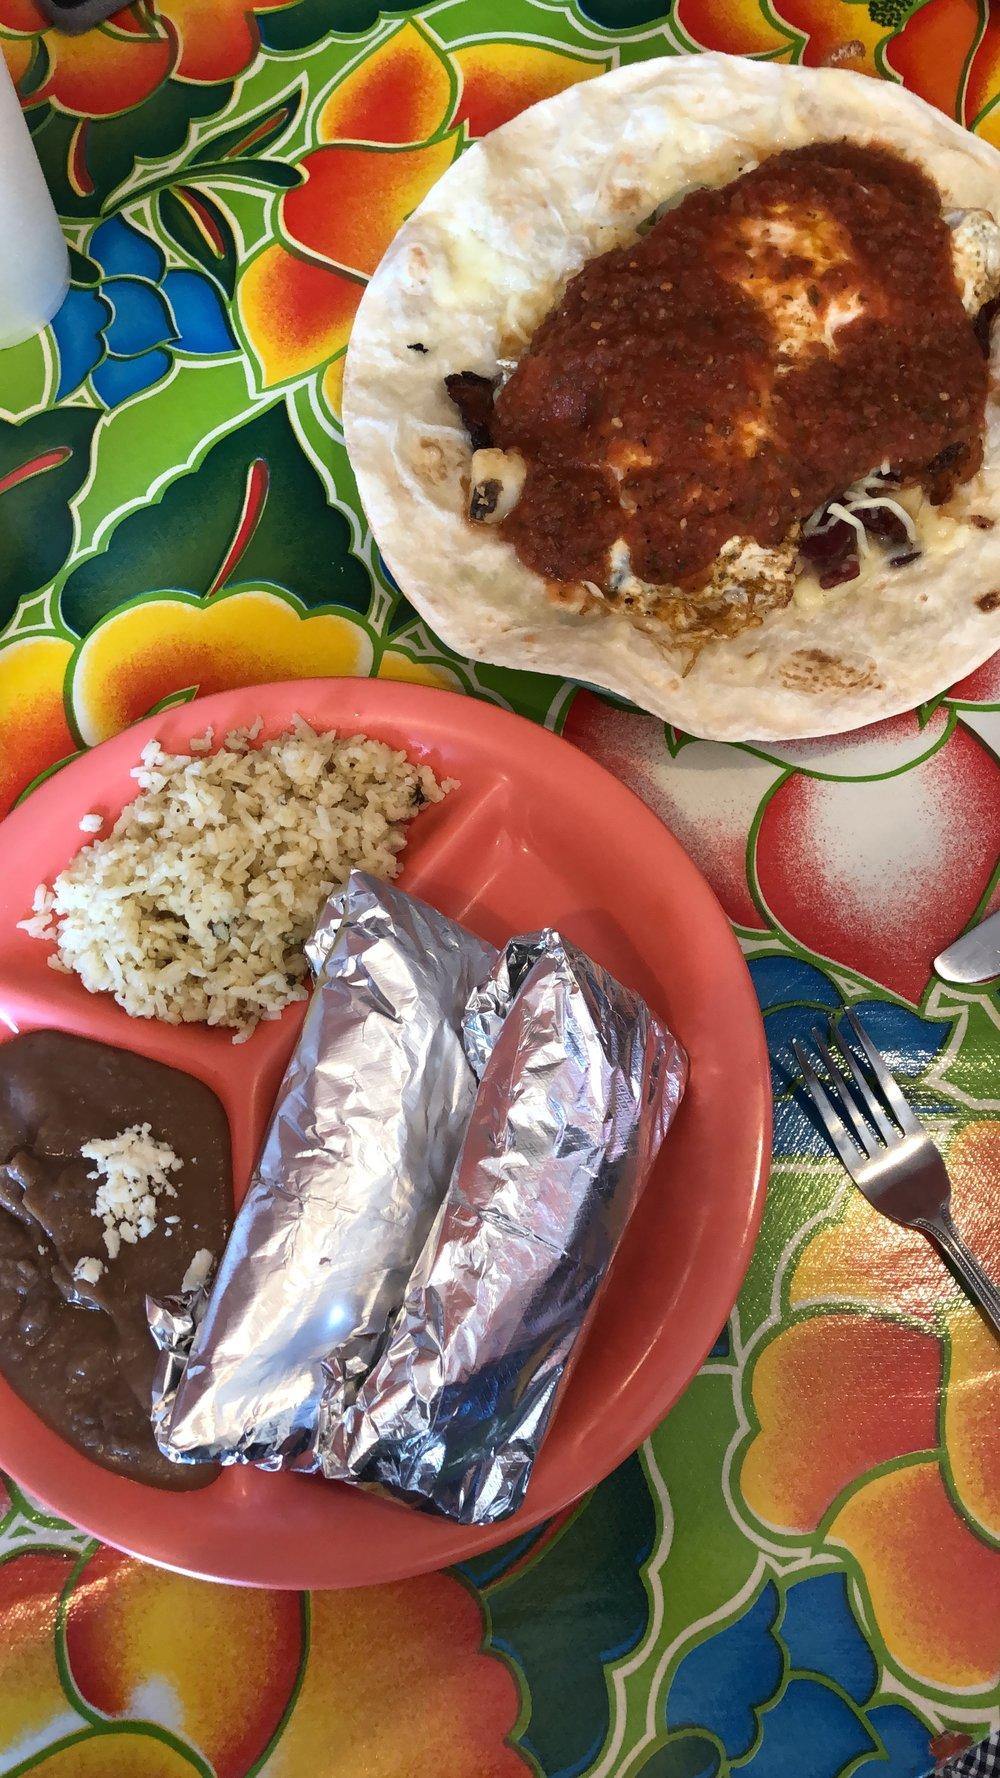 pacos-tacos-austin-texas.jpg